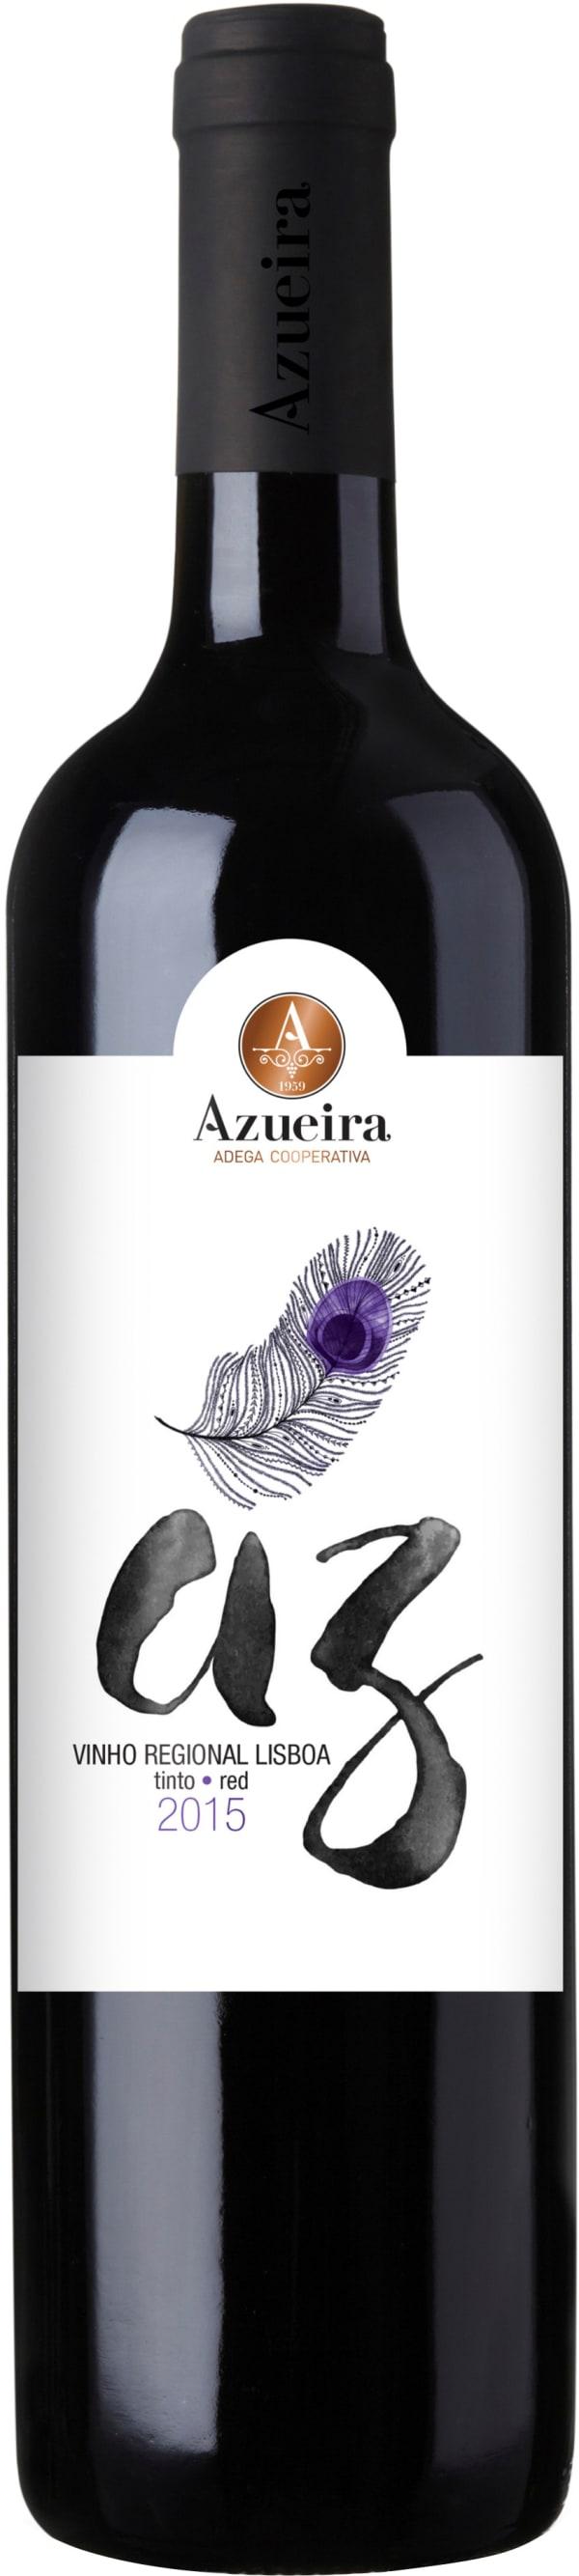 Azueira AZ Tinto 2018